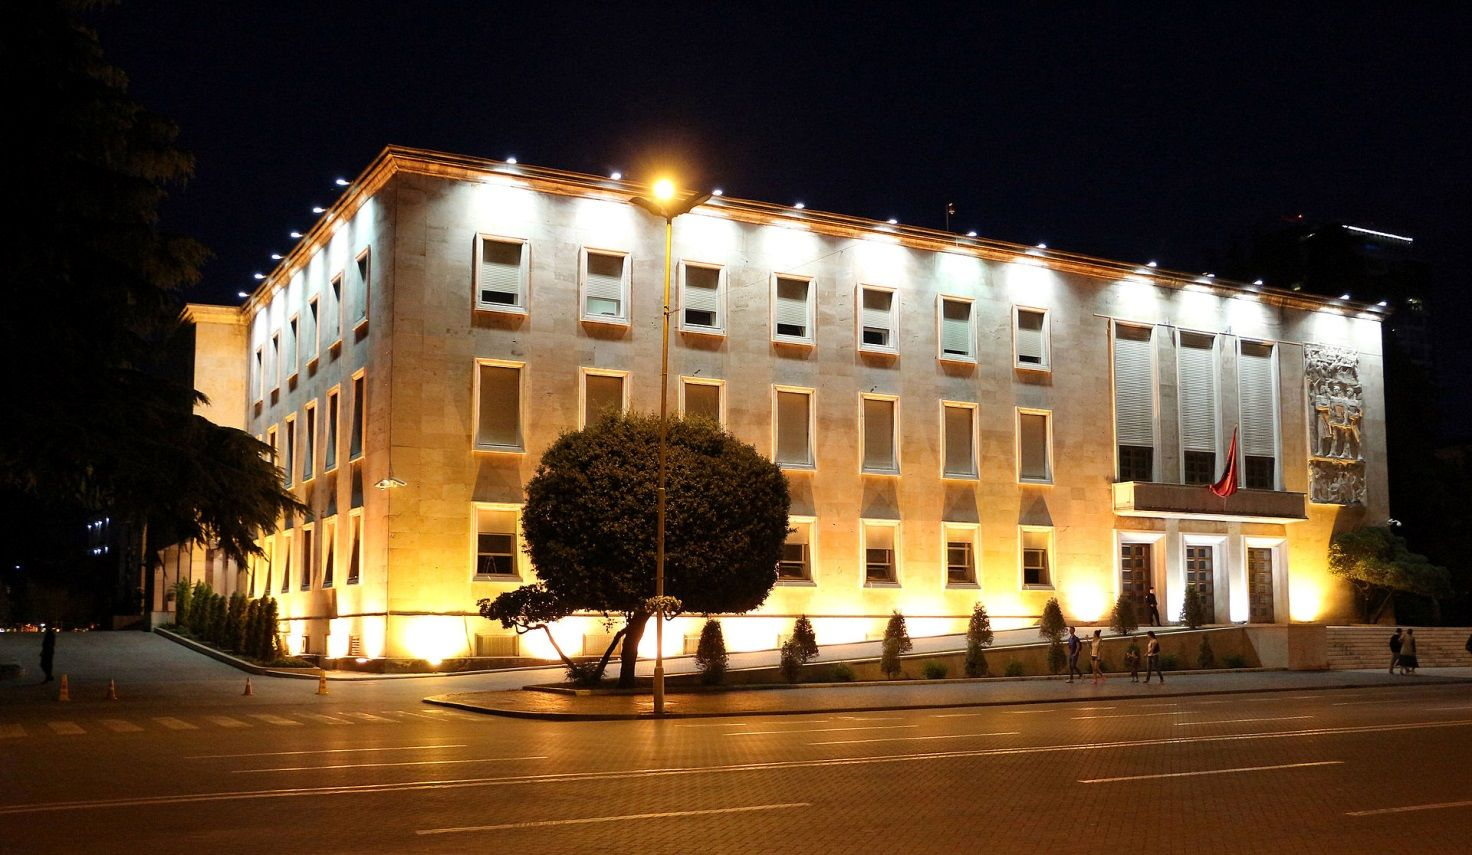 Вид на резиденцию премьер-министра (Kryeministria) и Совет министров Албании (Këshillit të Ministrave)